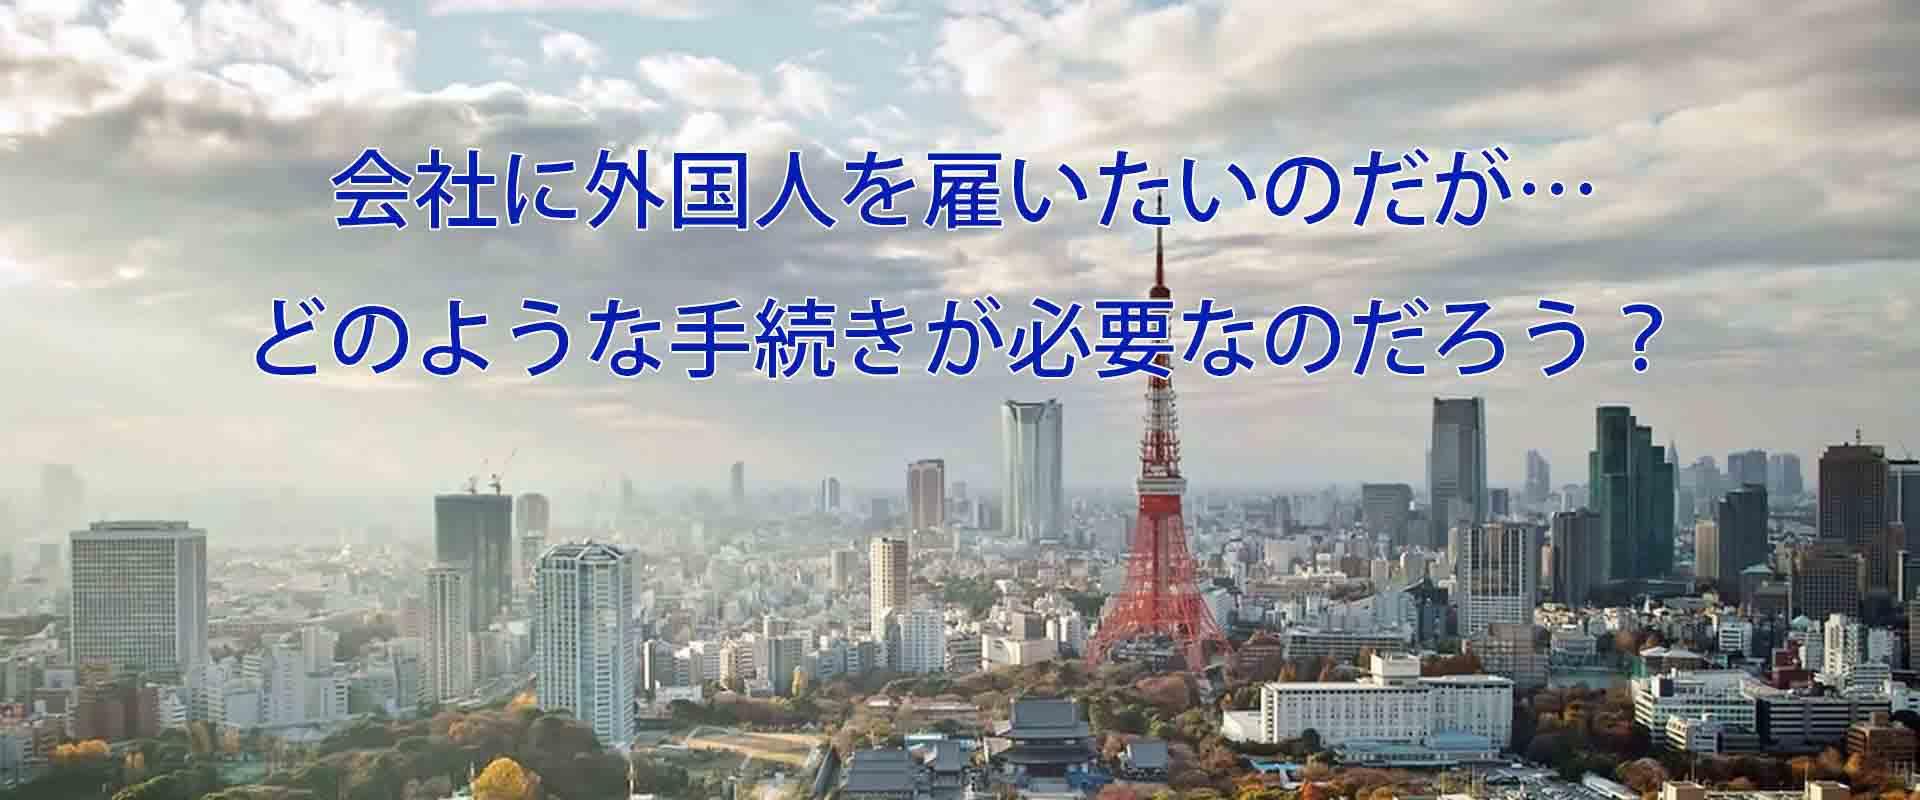 city_low